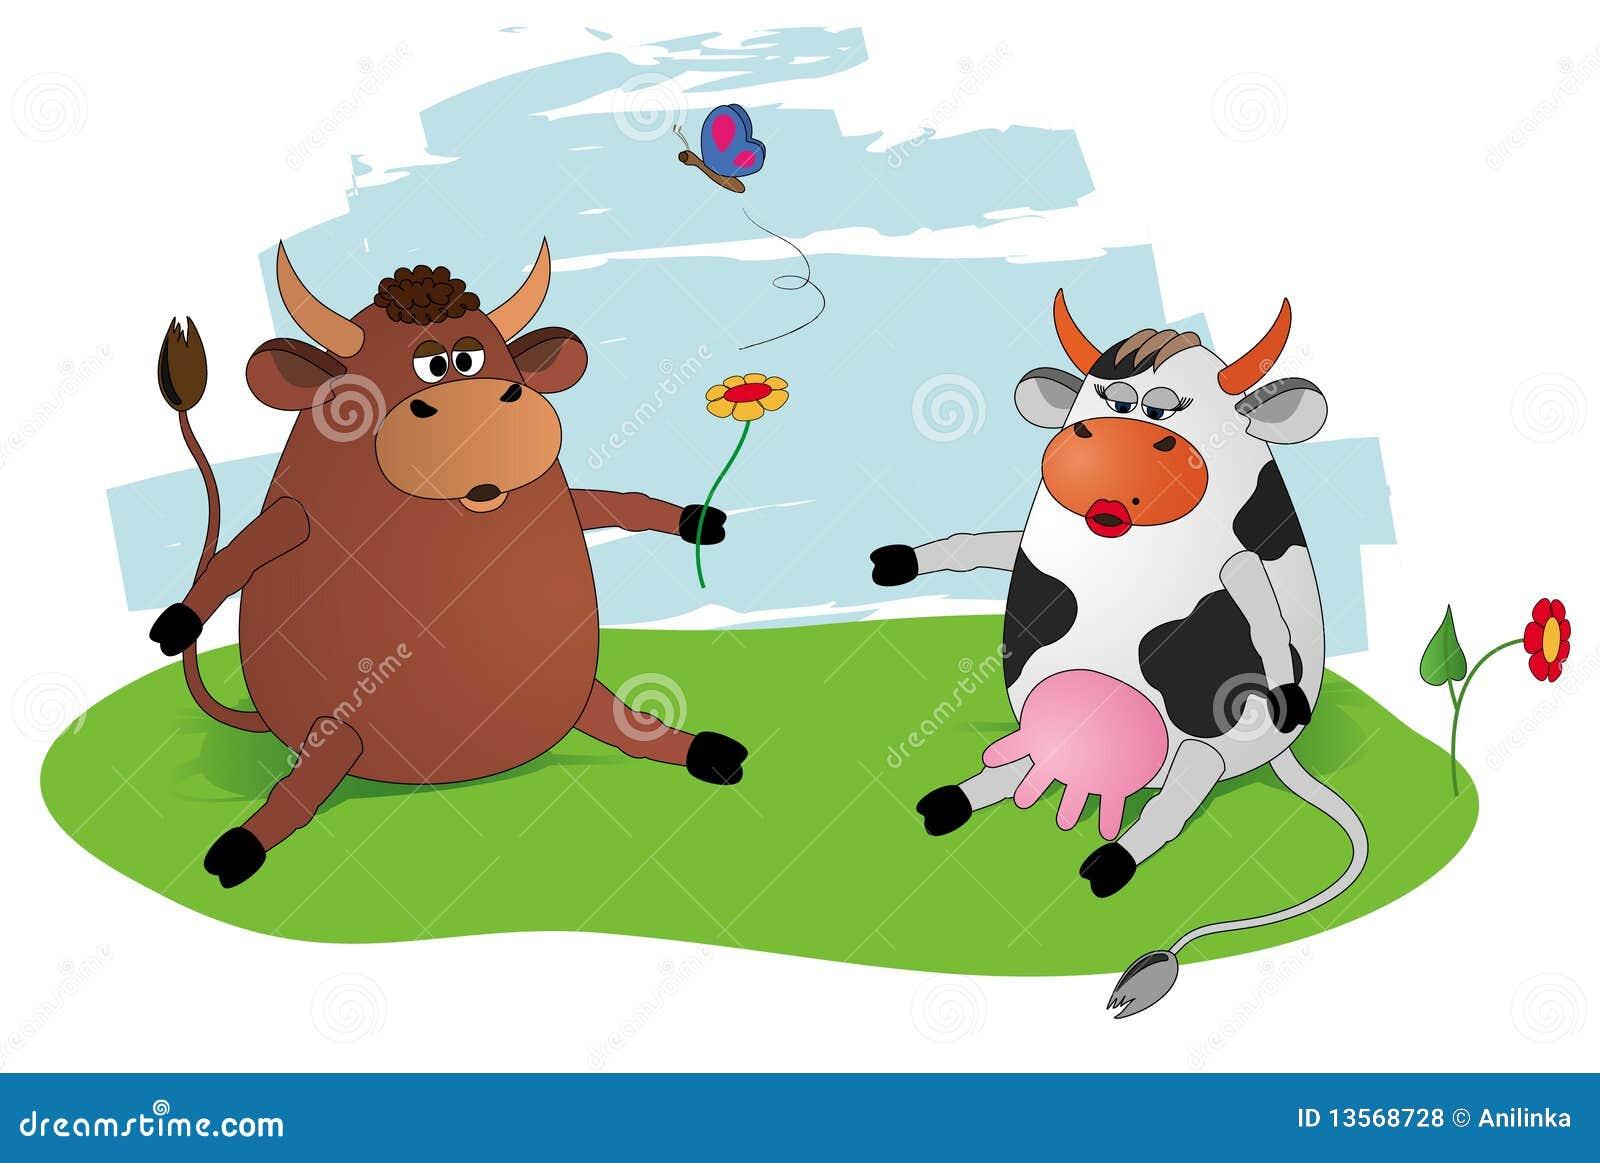 Cow Amp Bull Stock Vector Image Of Gift Fauna Cartoon